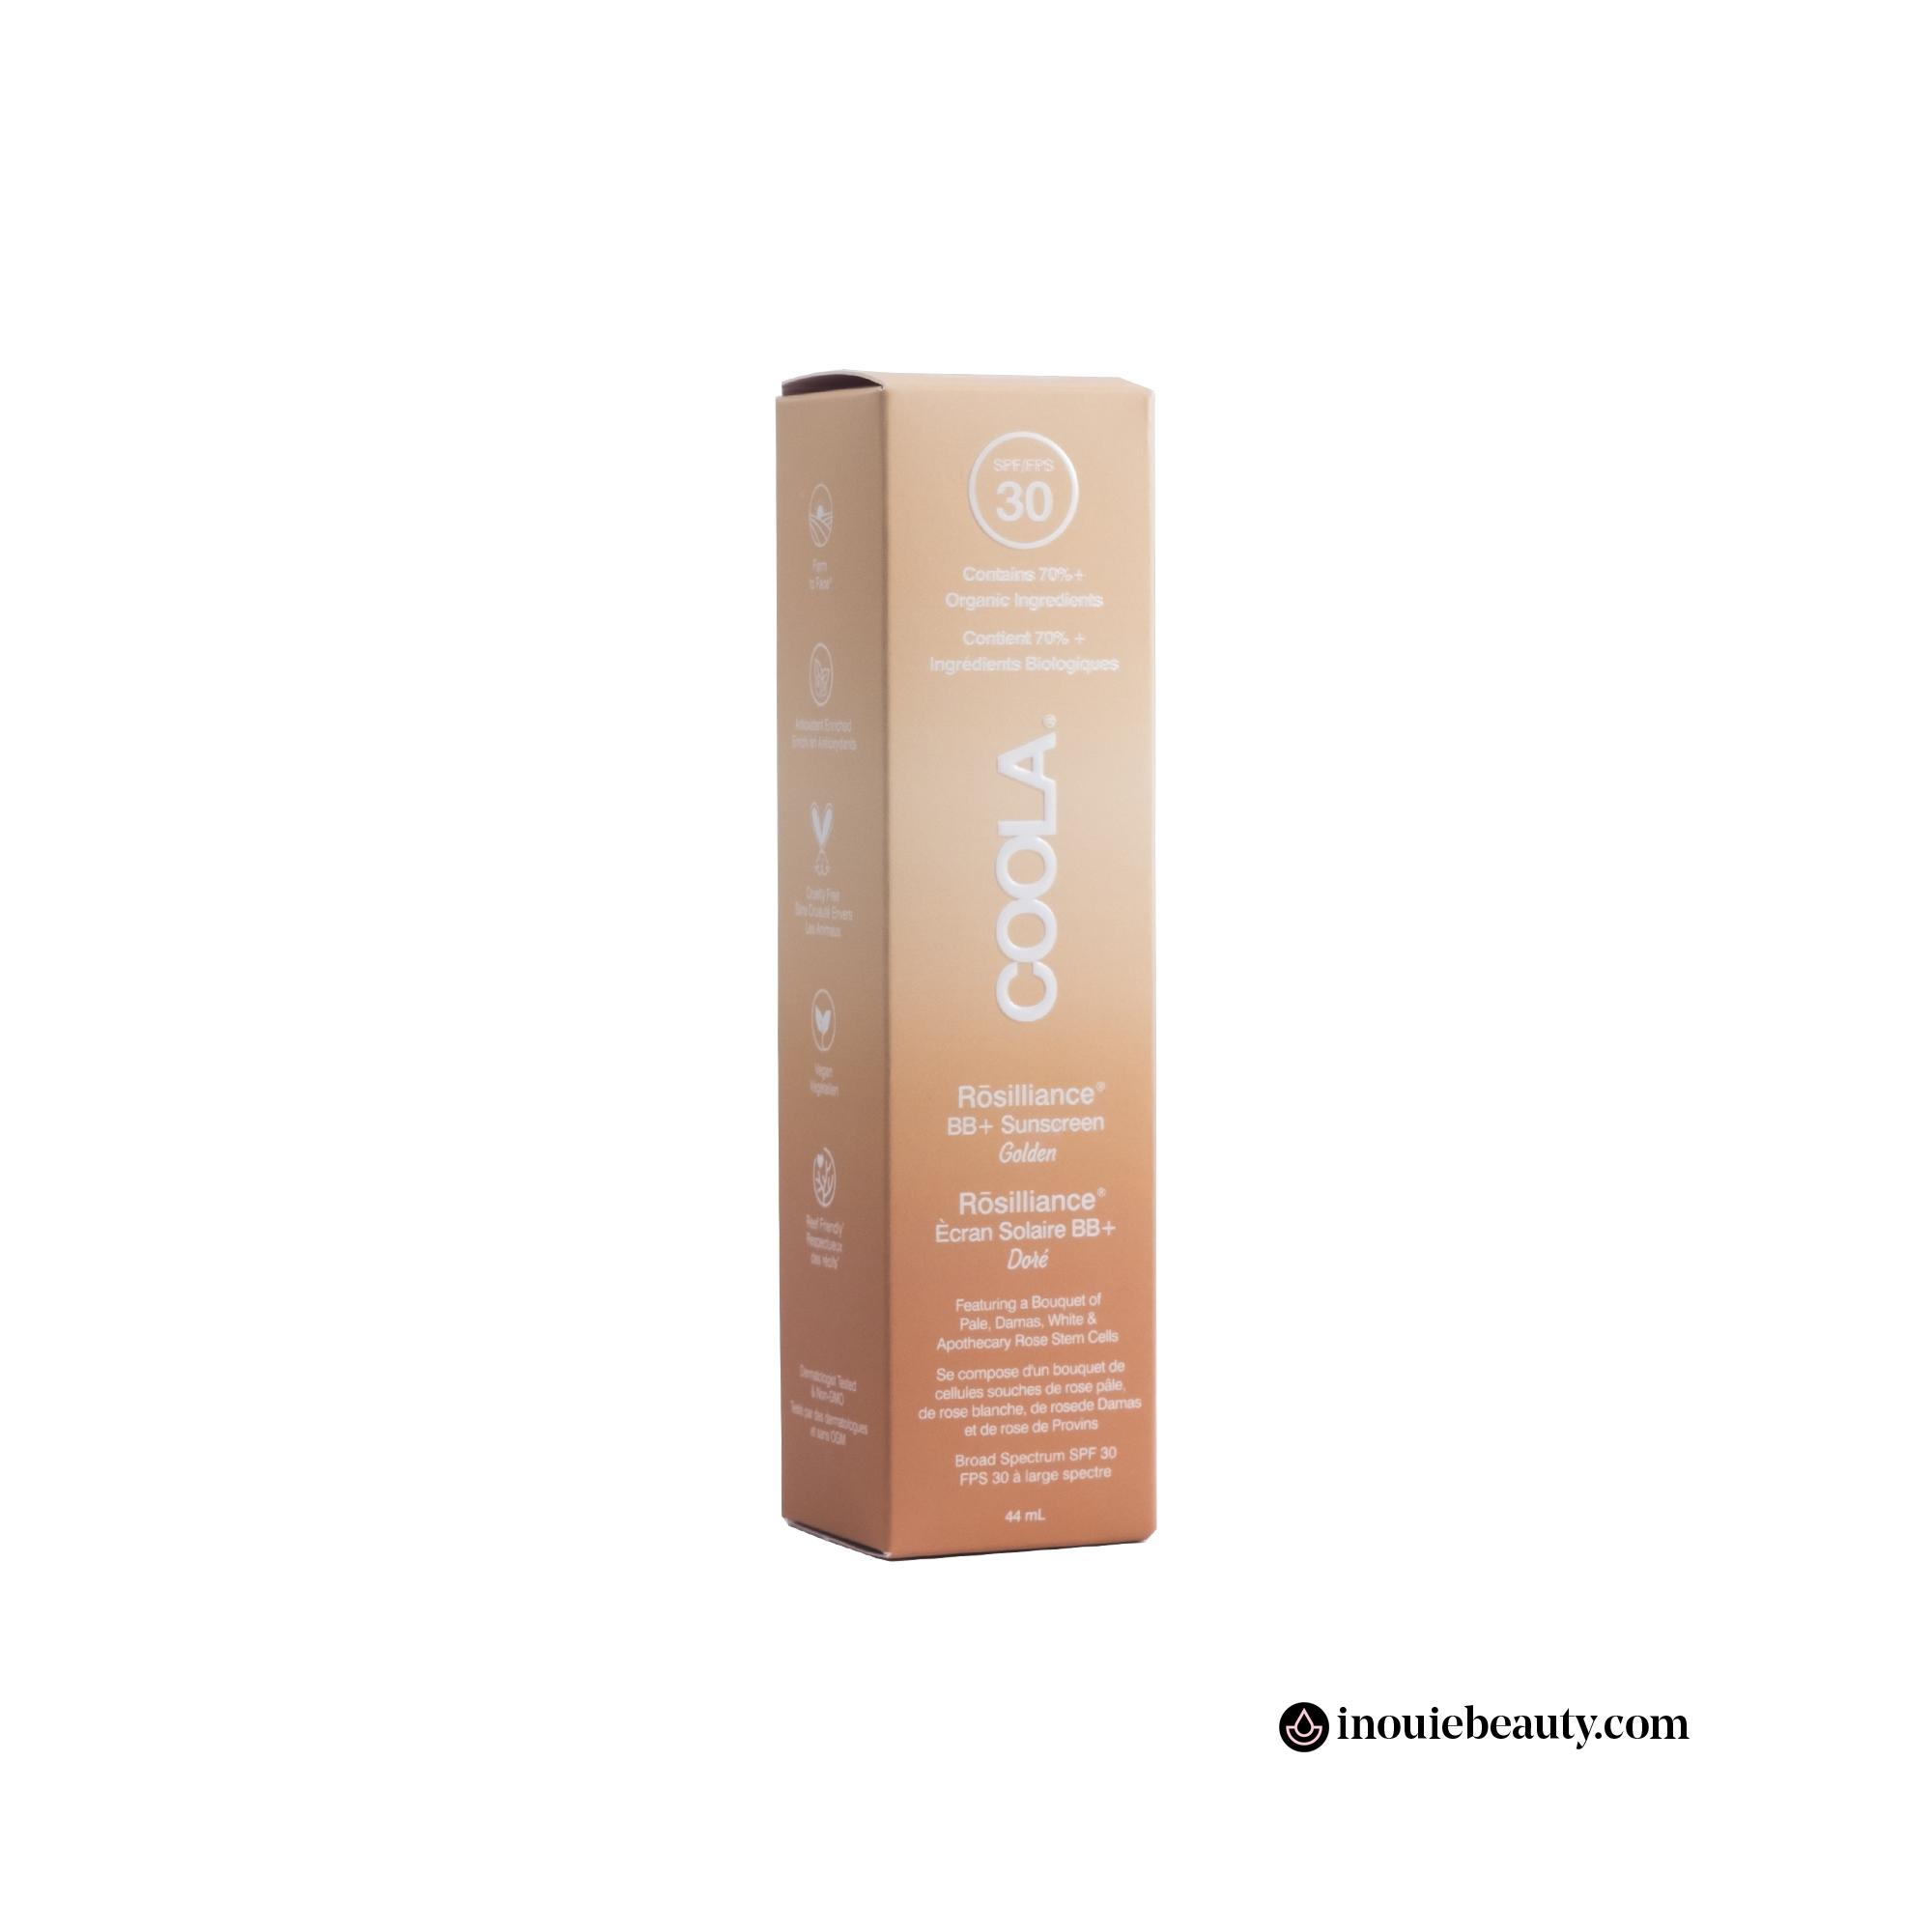 Coola Mineral Face SPF 30 Rosilliance BB+ Cream - Golden